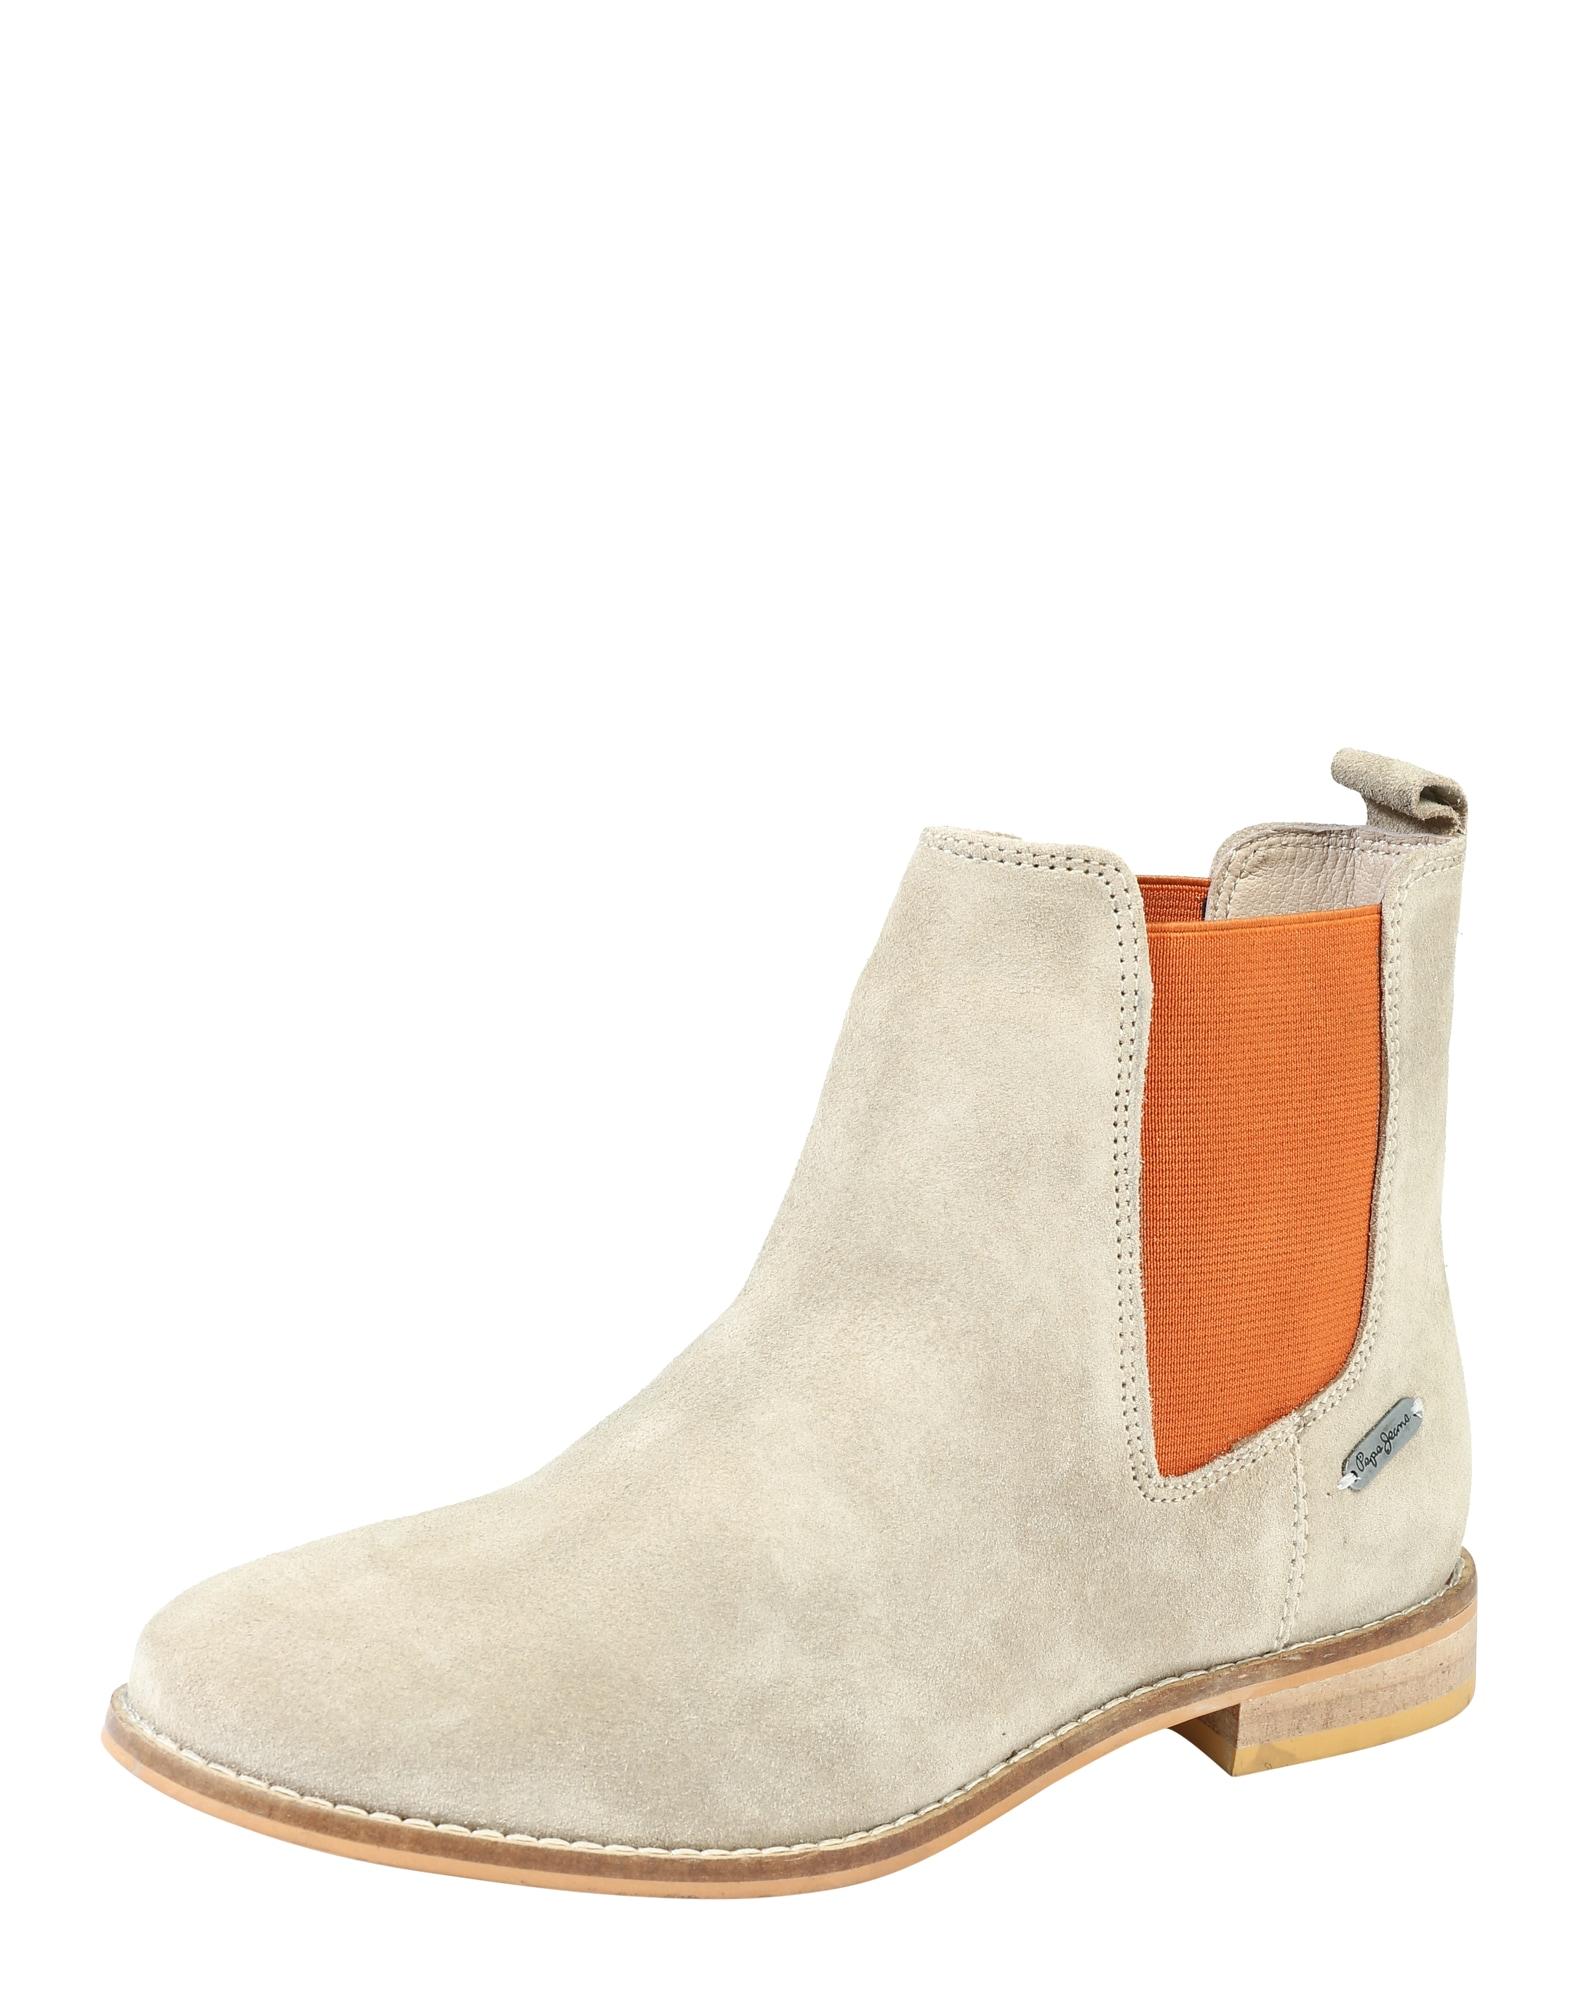 Pepe Jeans Dames Chelsea boots Galp sand donkeroranje